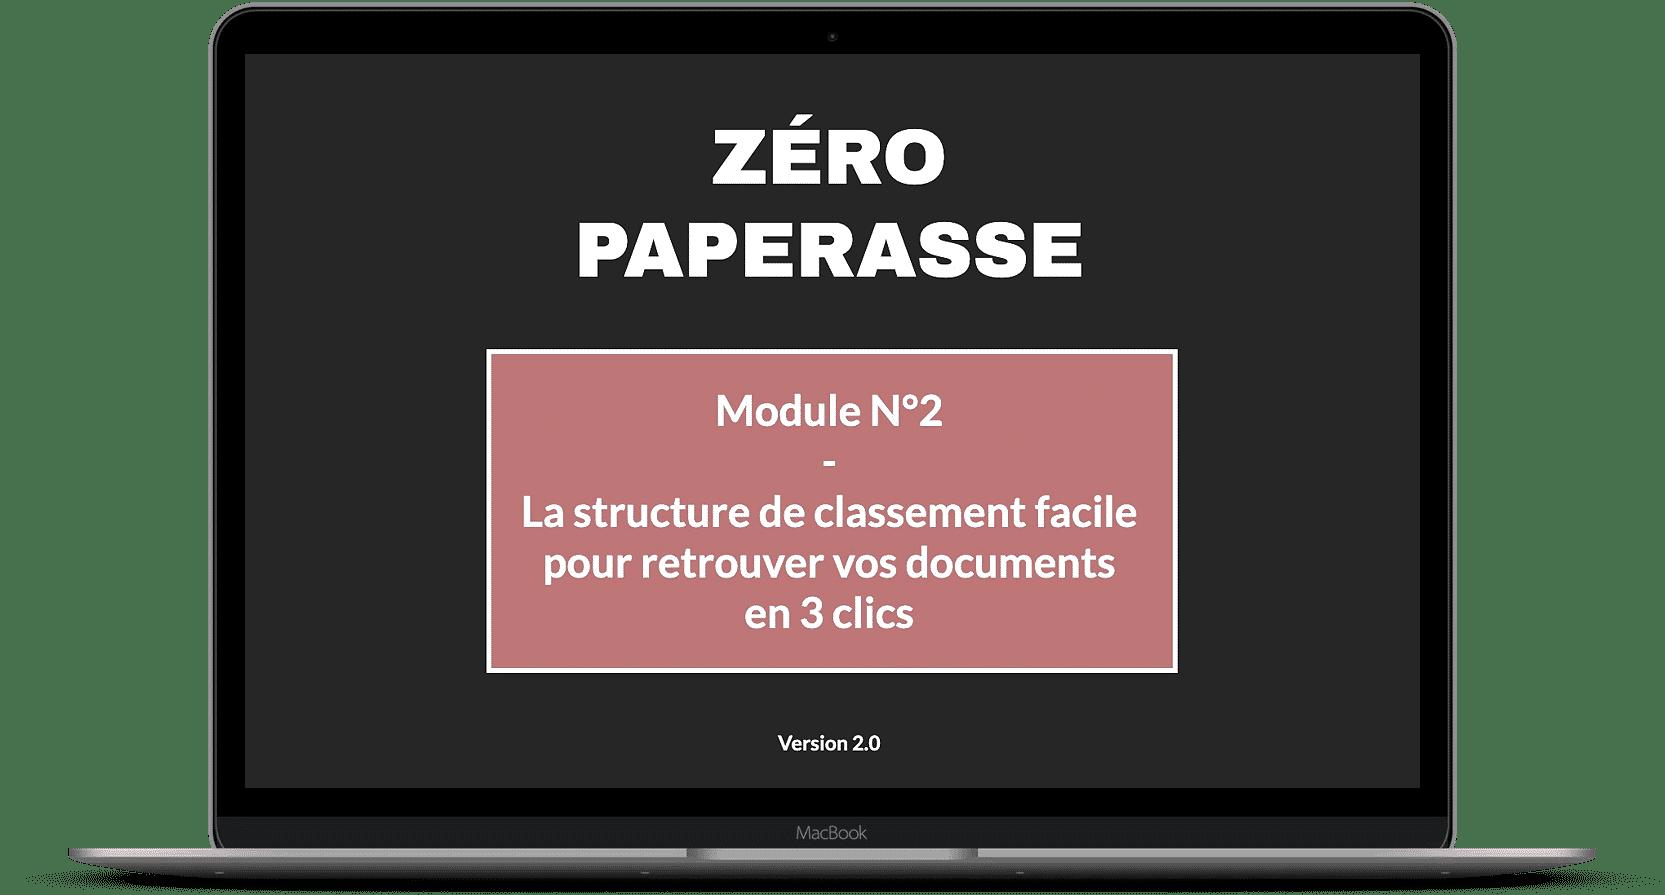 Zéro paperasse module 2